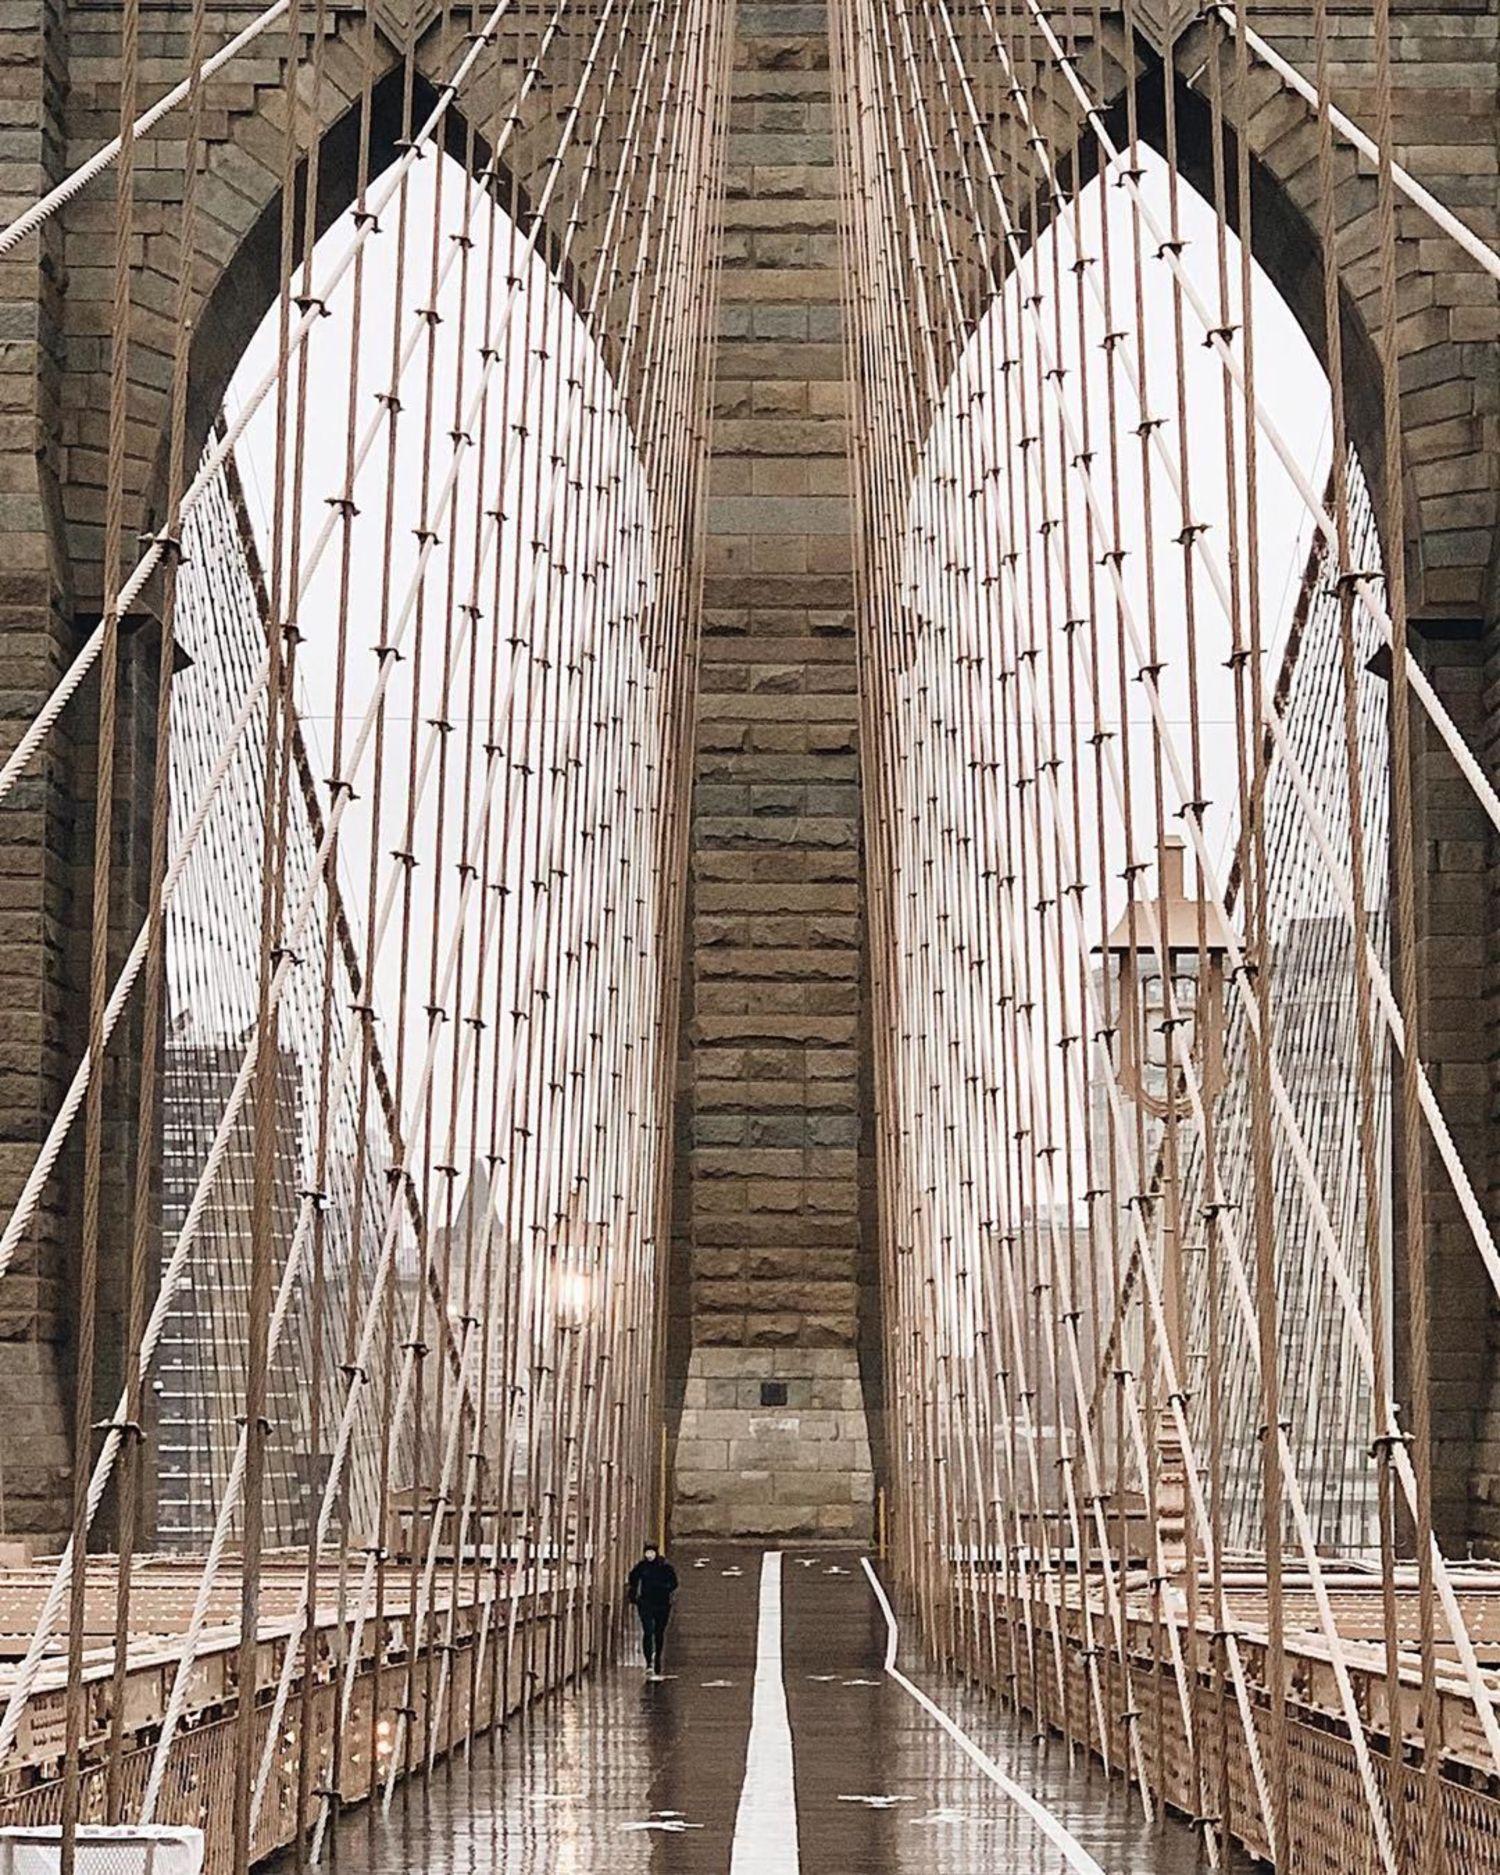 Brooklyn Bridge, New York. Photo via @iwyndt #viewingnyc #nyc #newyork #newyorkcity